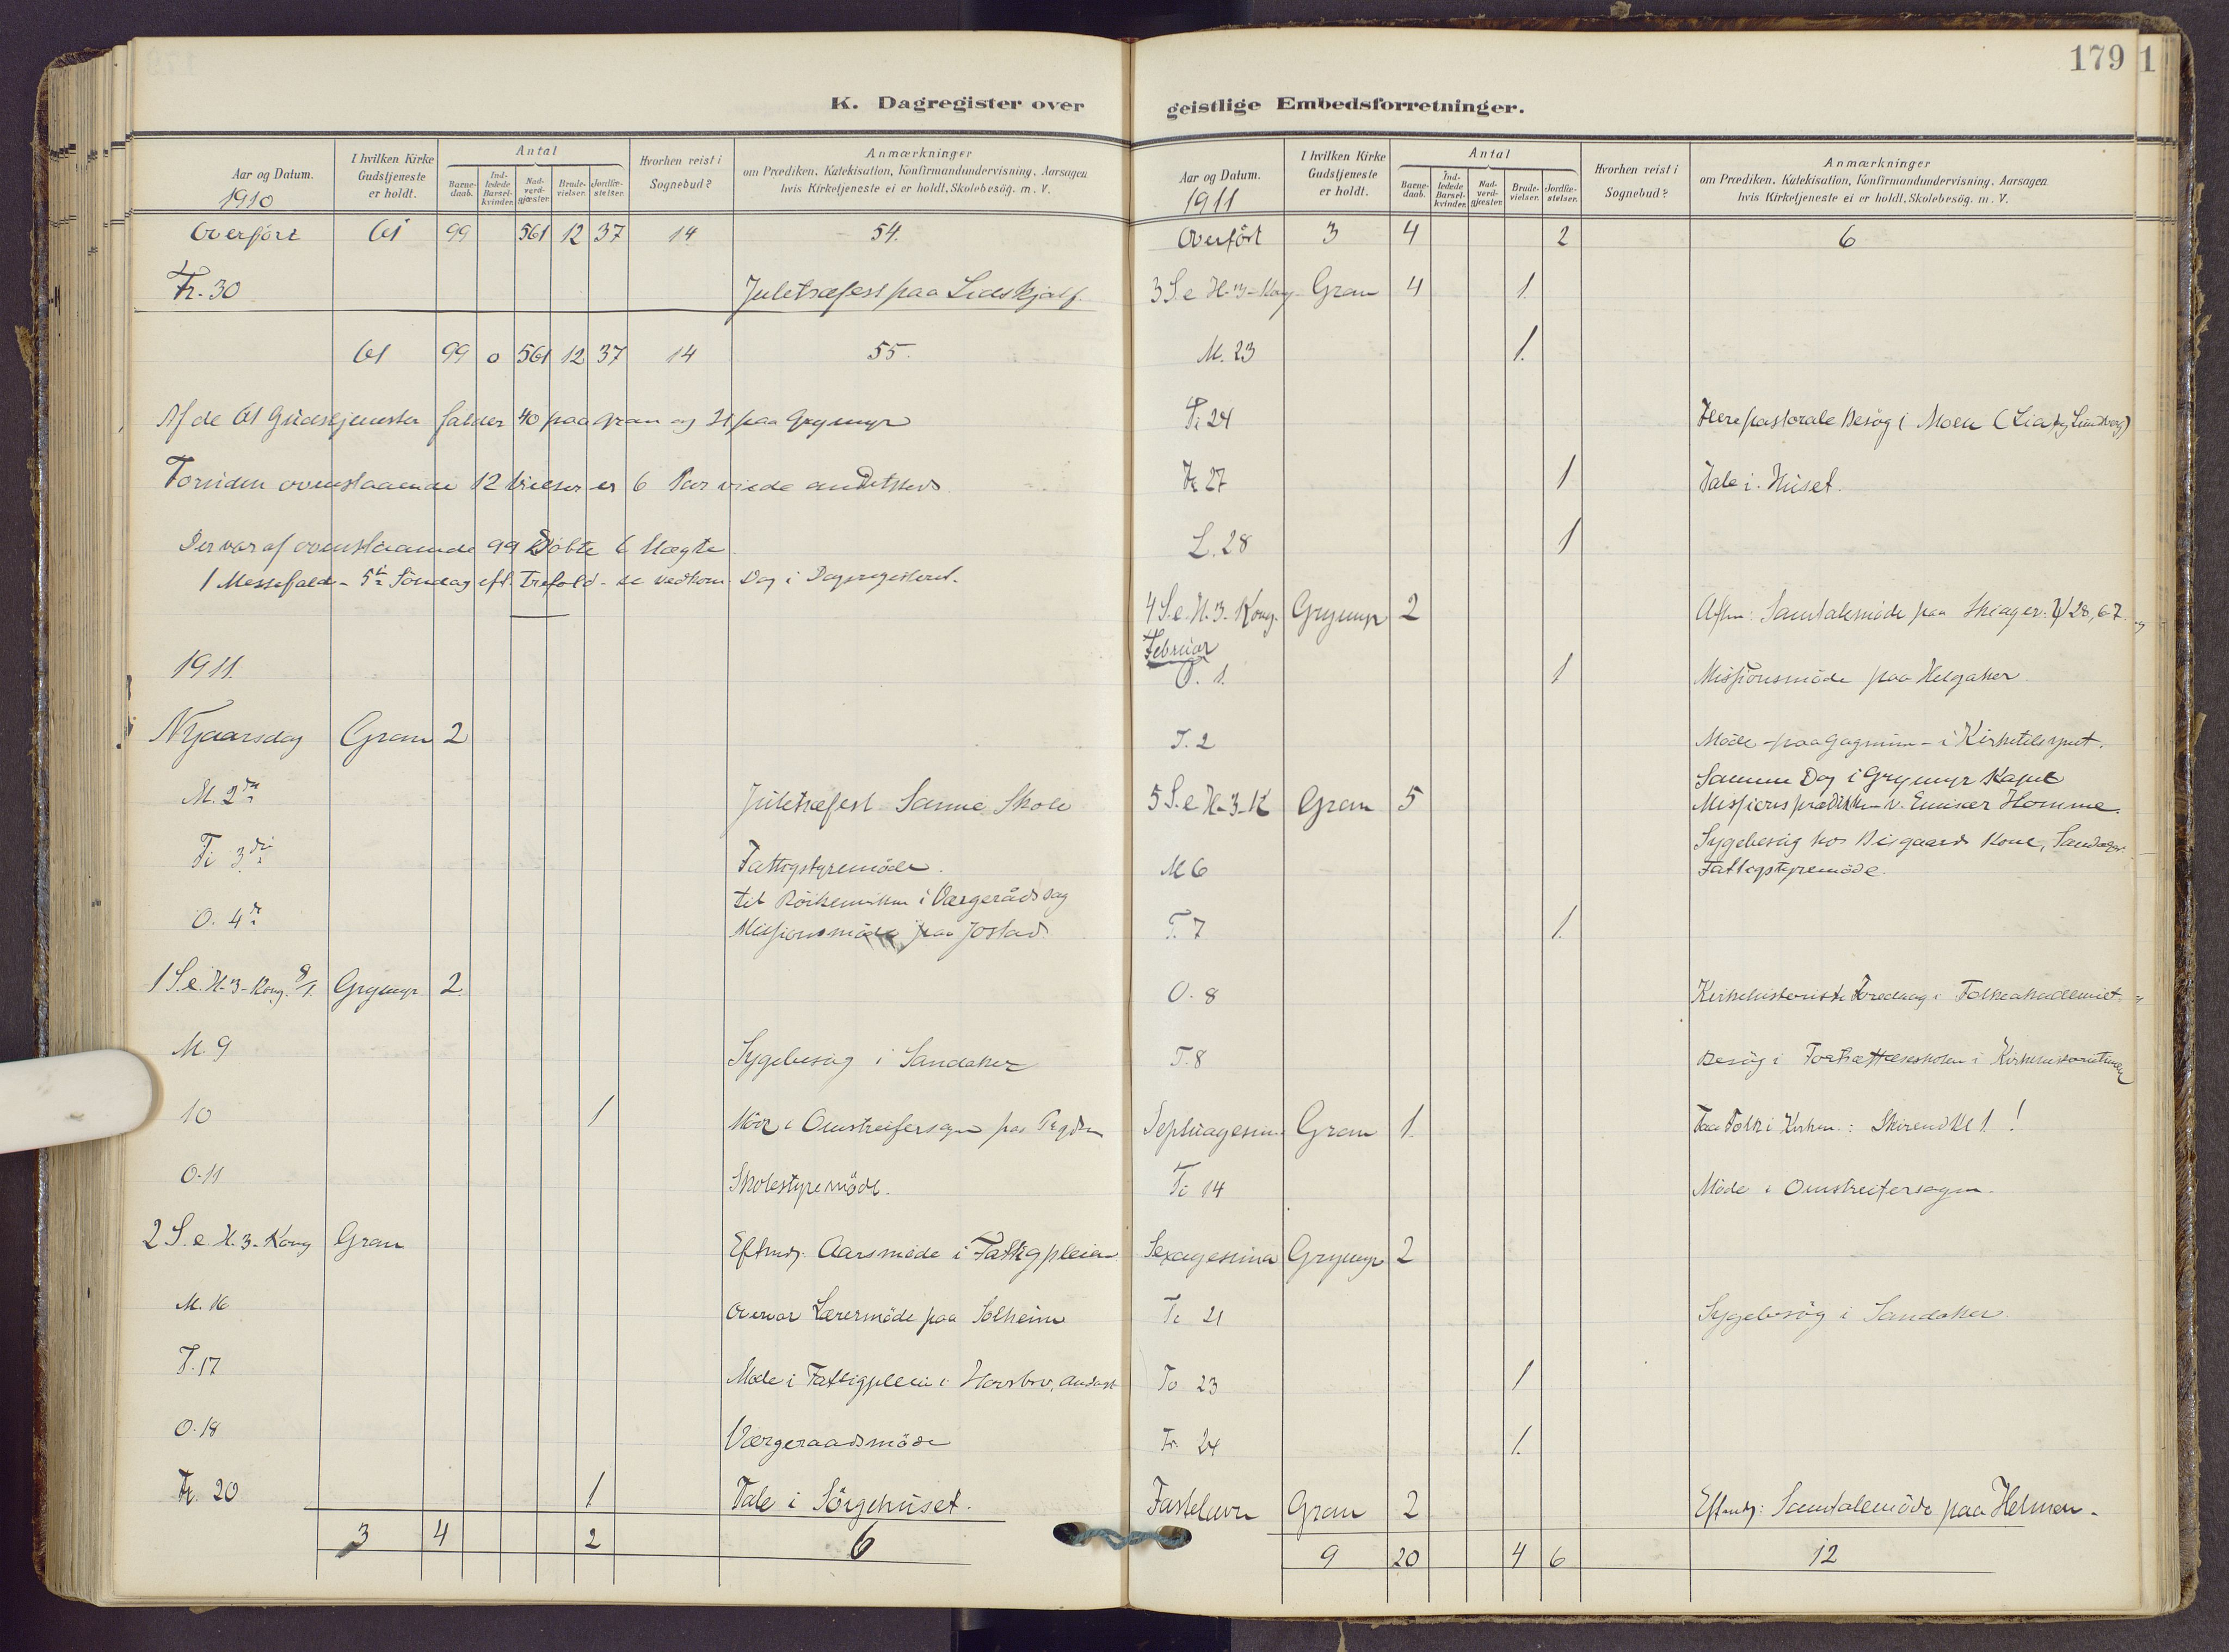 SAH, Gran prestekontor, Ministerialbok nr. 22, 1908-1918, s. 179